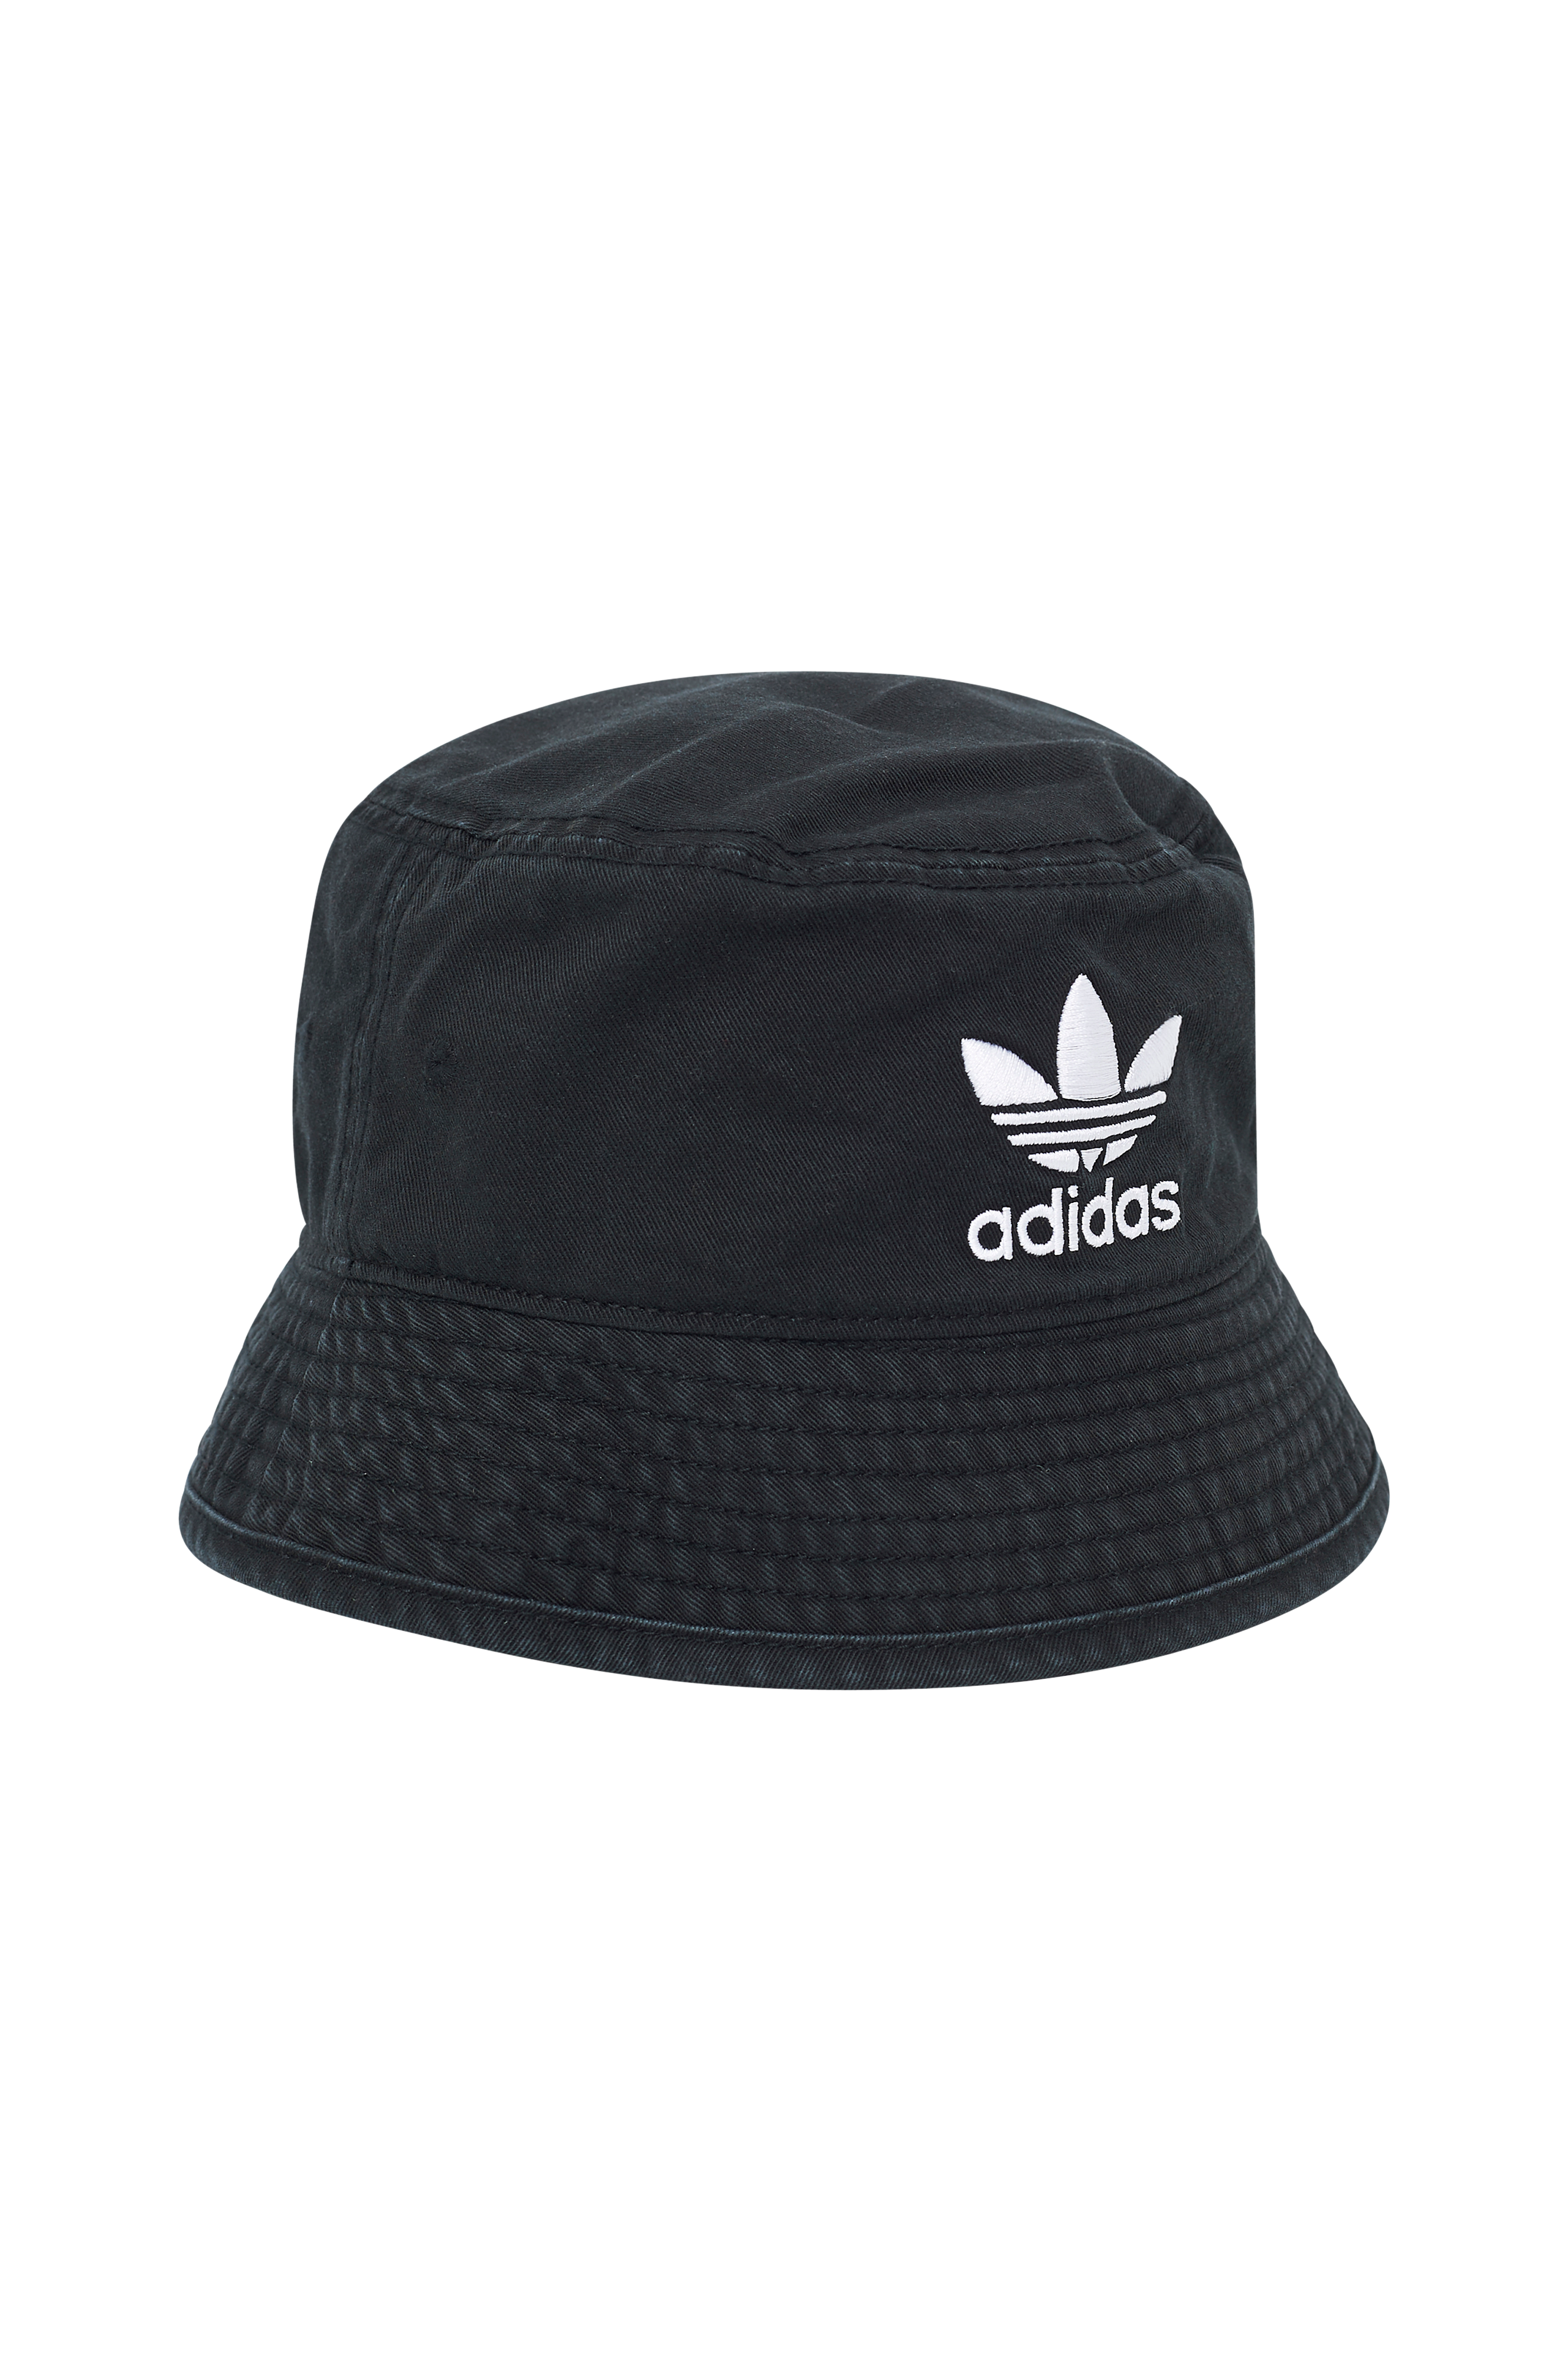 7d5a12083aff2 adidas Originals Adicolor Bucket Hat hattu - Musta - Naiset - Ellos.fi